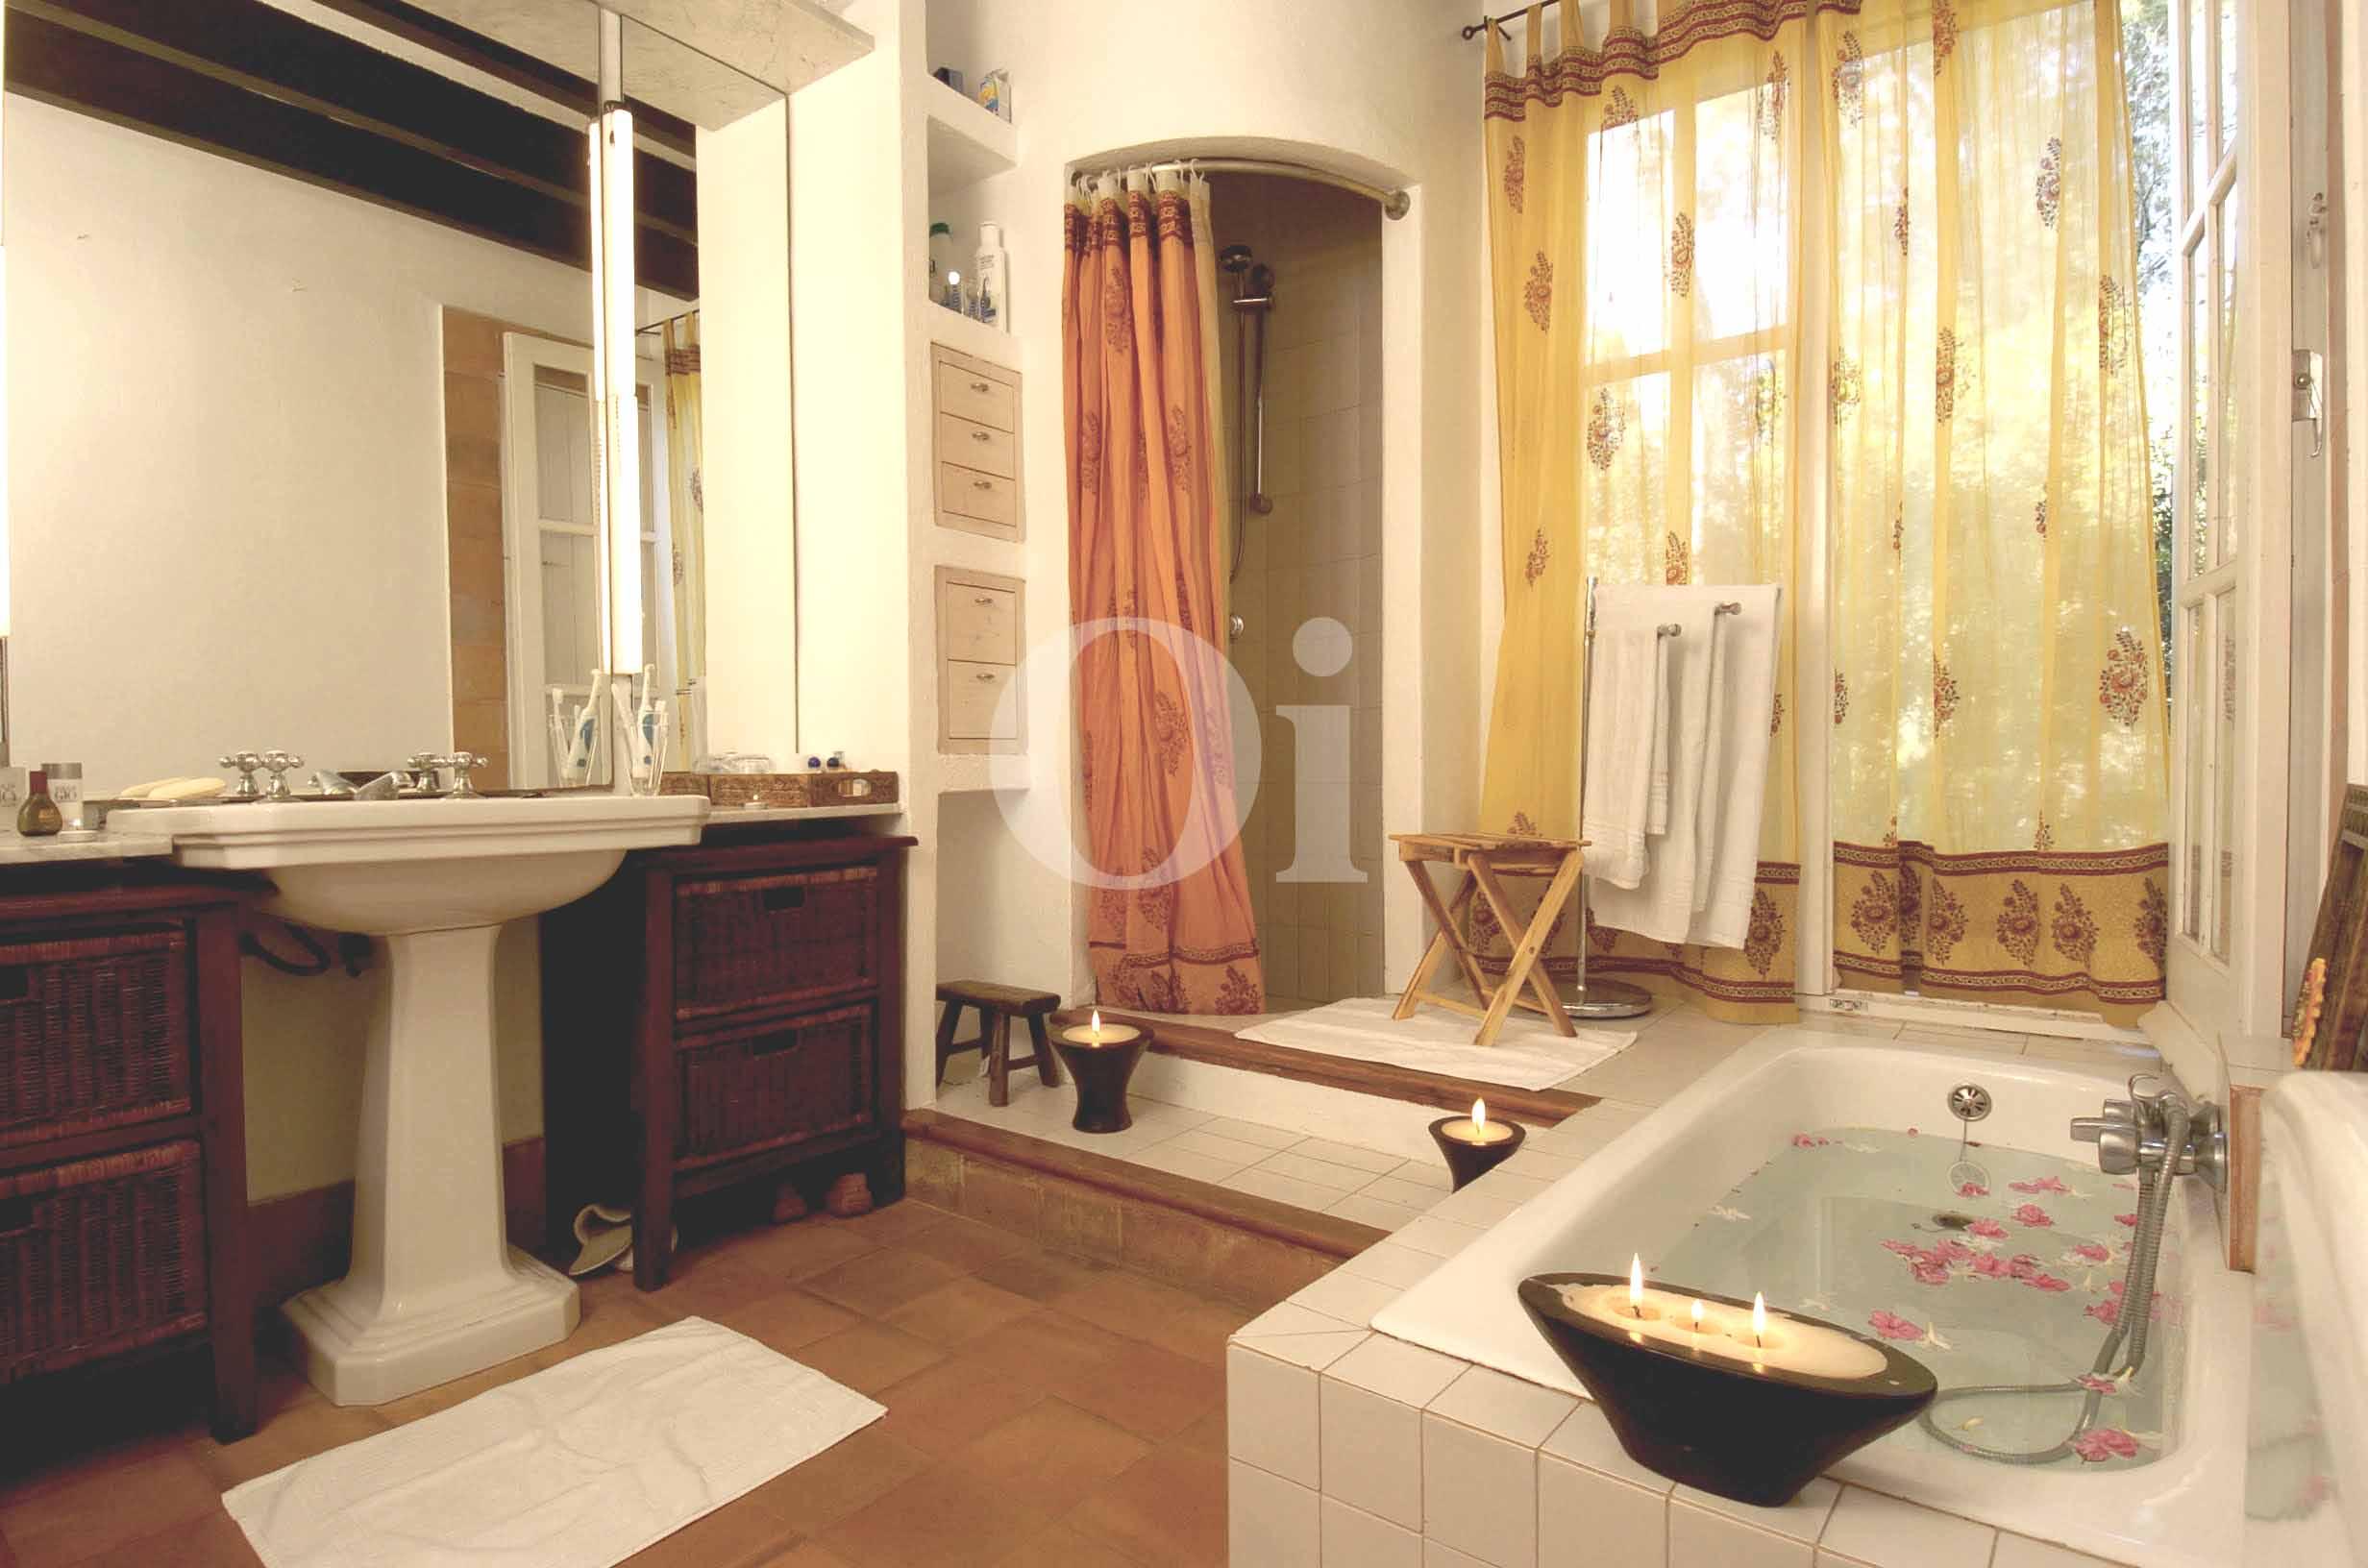 Ванная комната на потрясающей вилле в краткосрочную аренду на Ибице